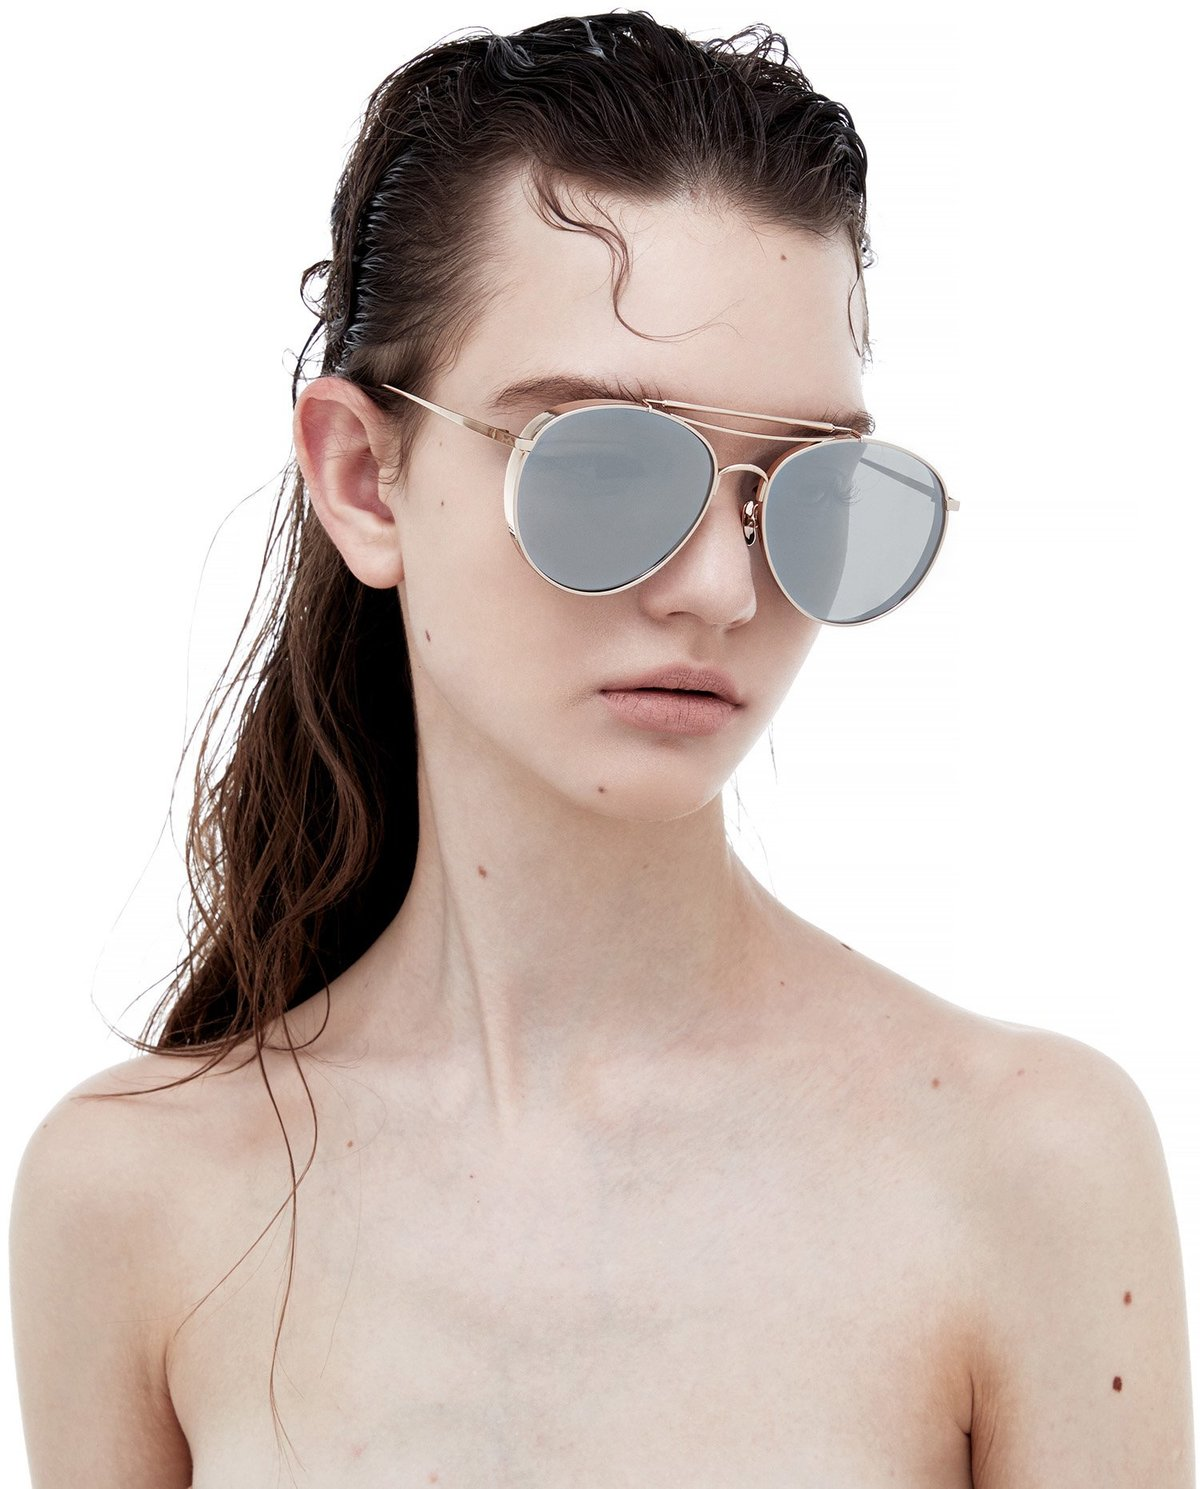 be36c8f5a7 Gentle Monster Big Bully 032(1M) 56mm Sunglasses